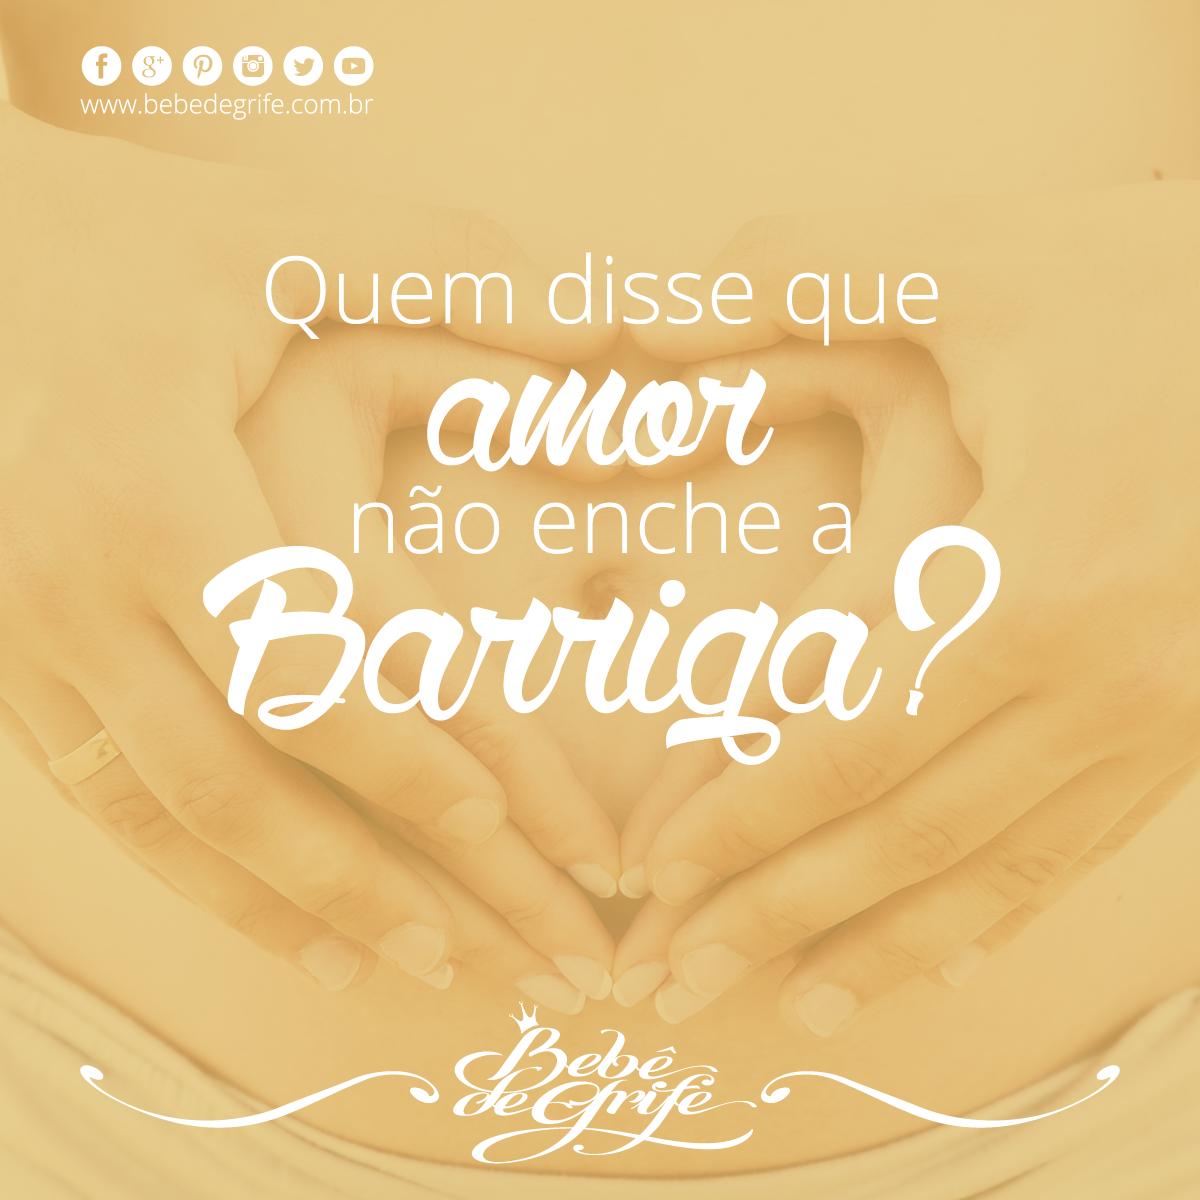 #amorenchebarriga #bebedegrife #bbdgrife